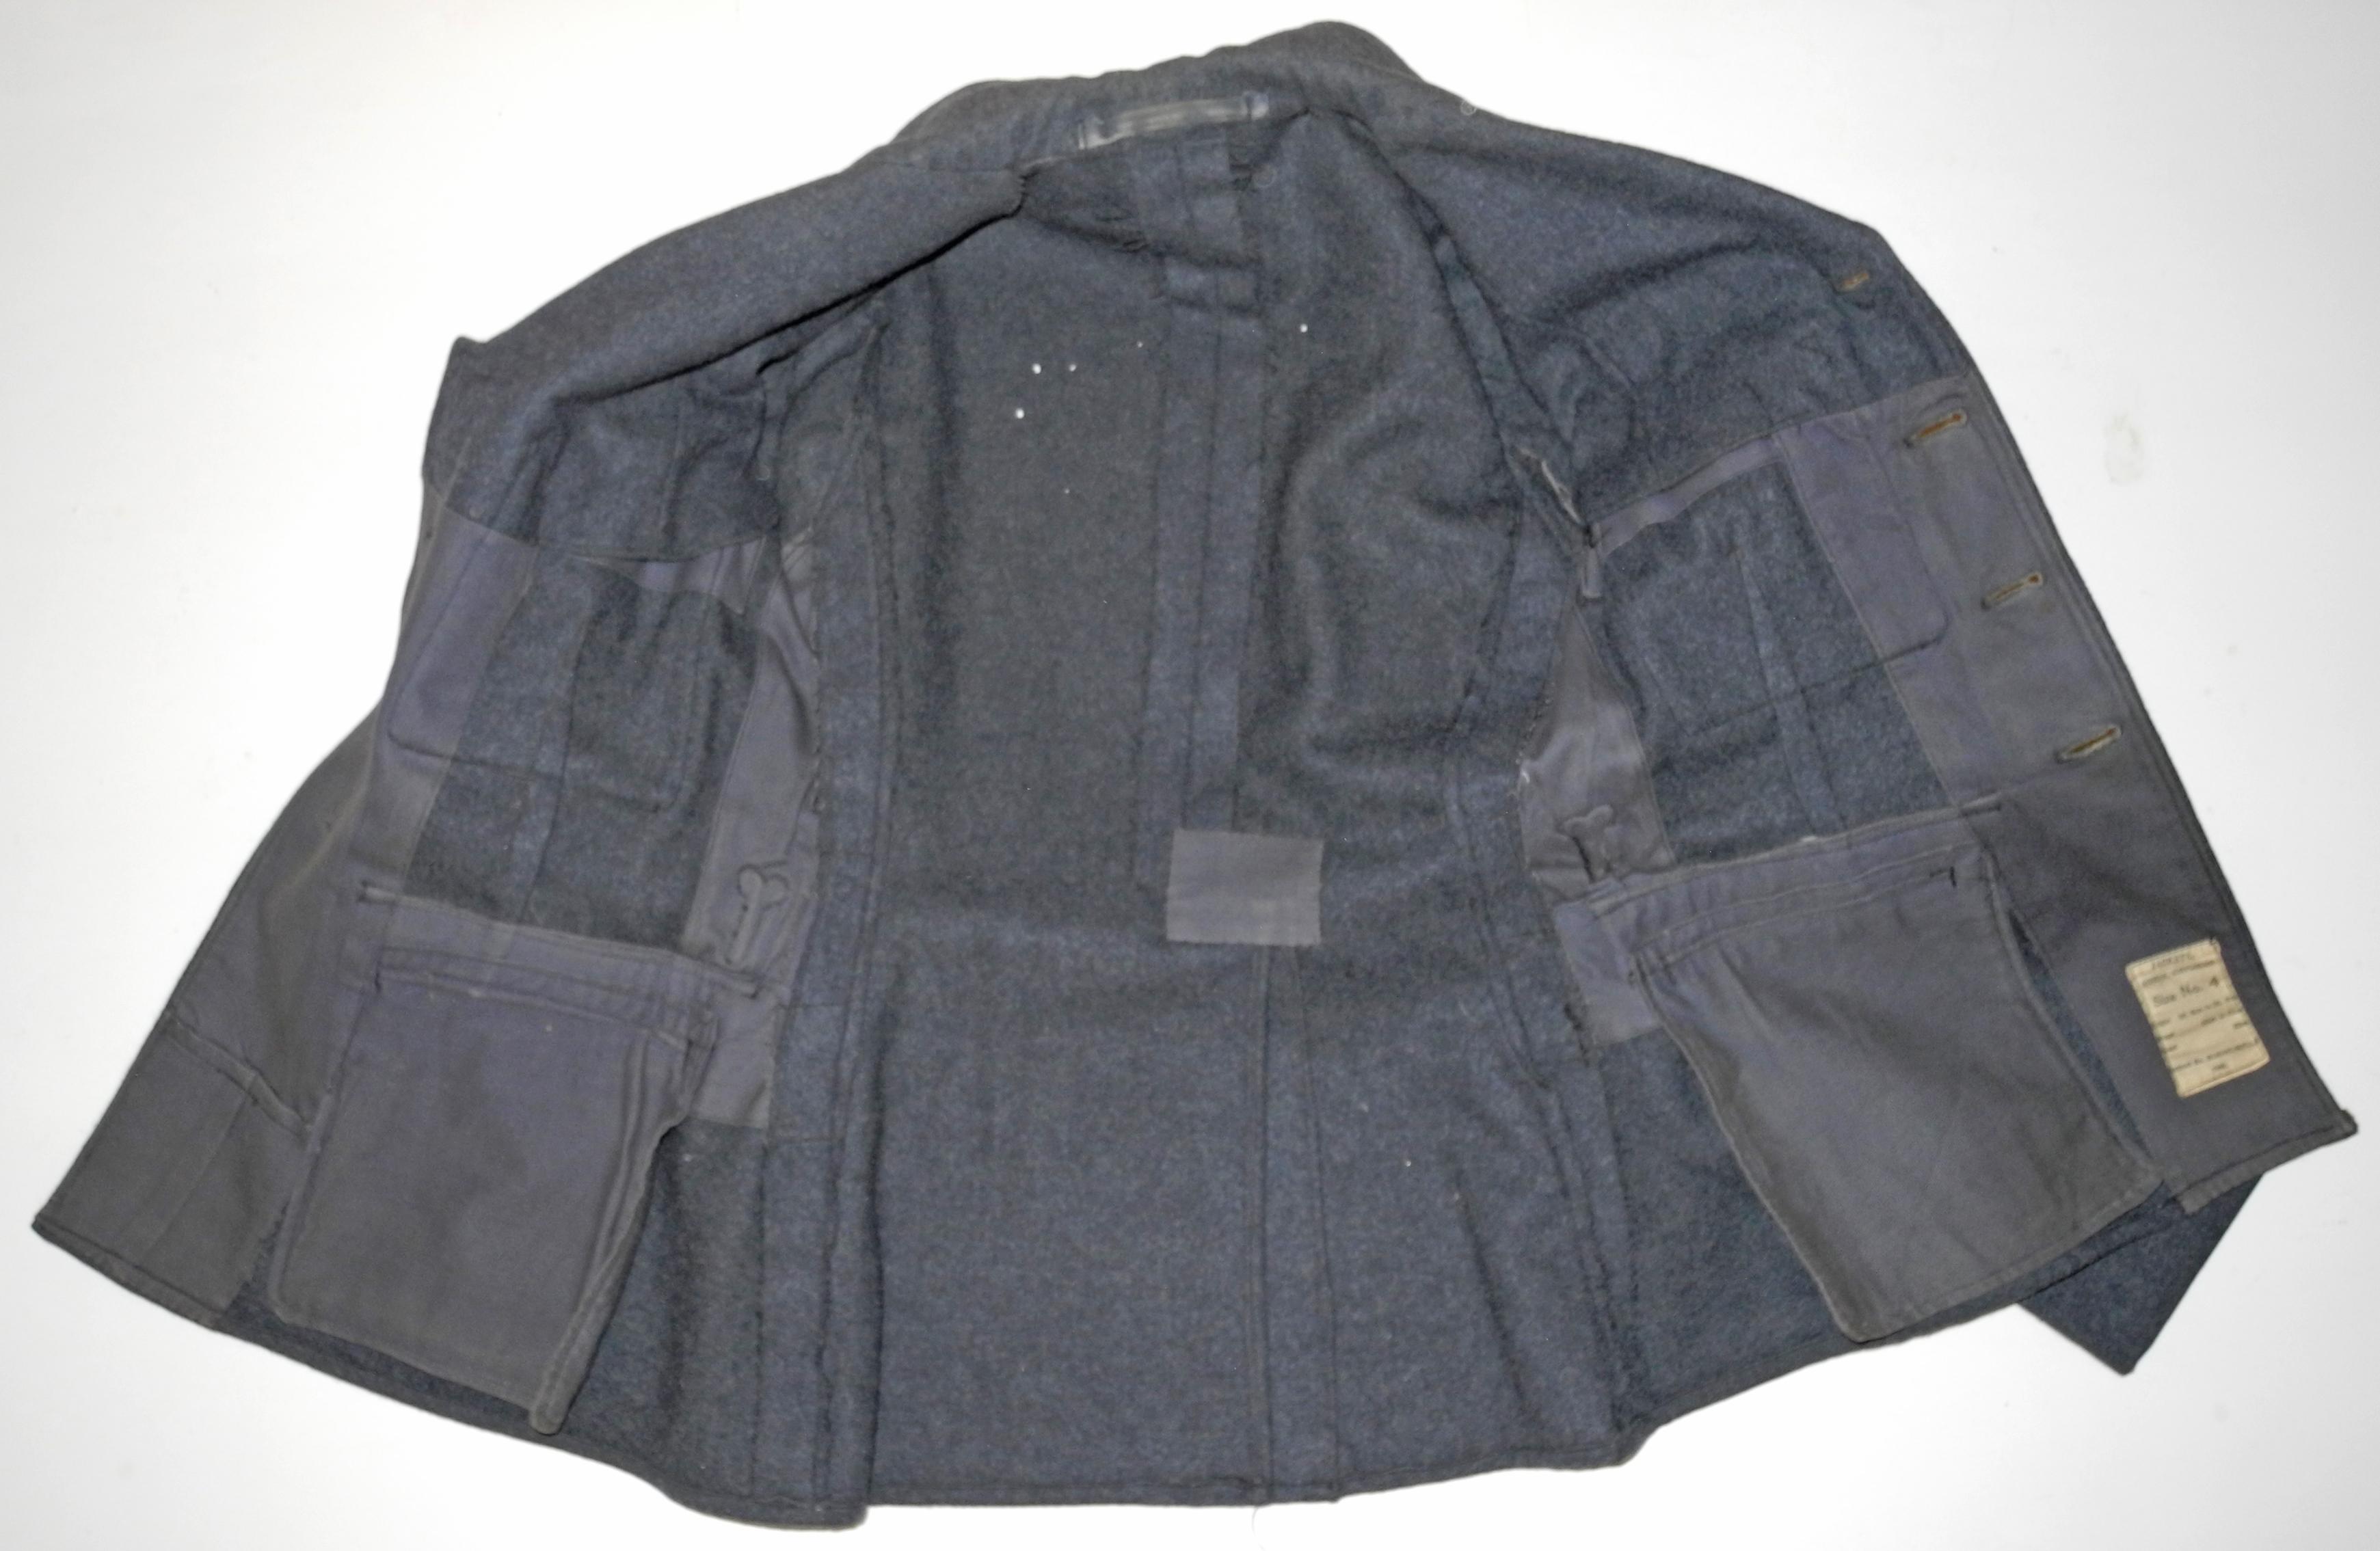 RAF Flight Sergeant pilot's Service Dress jacket dated 1940